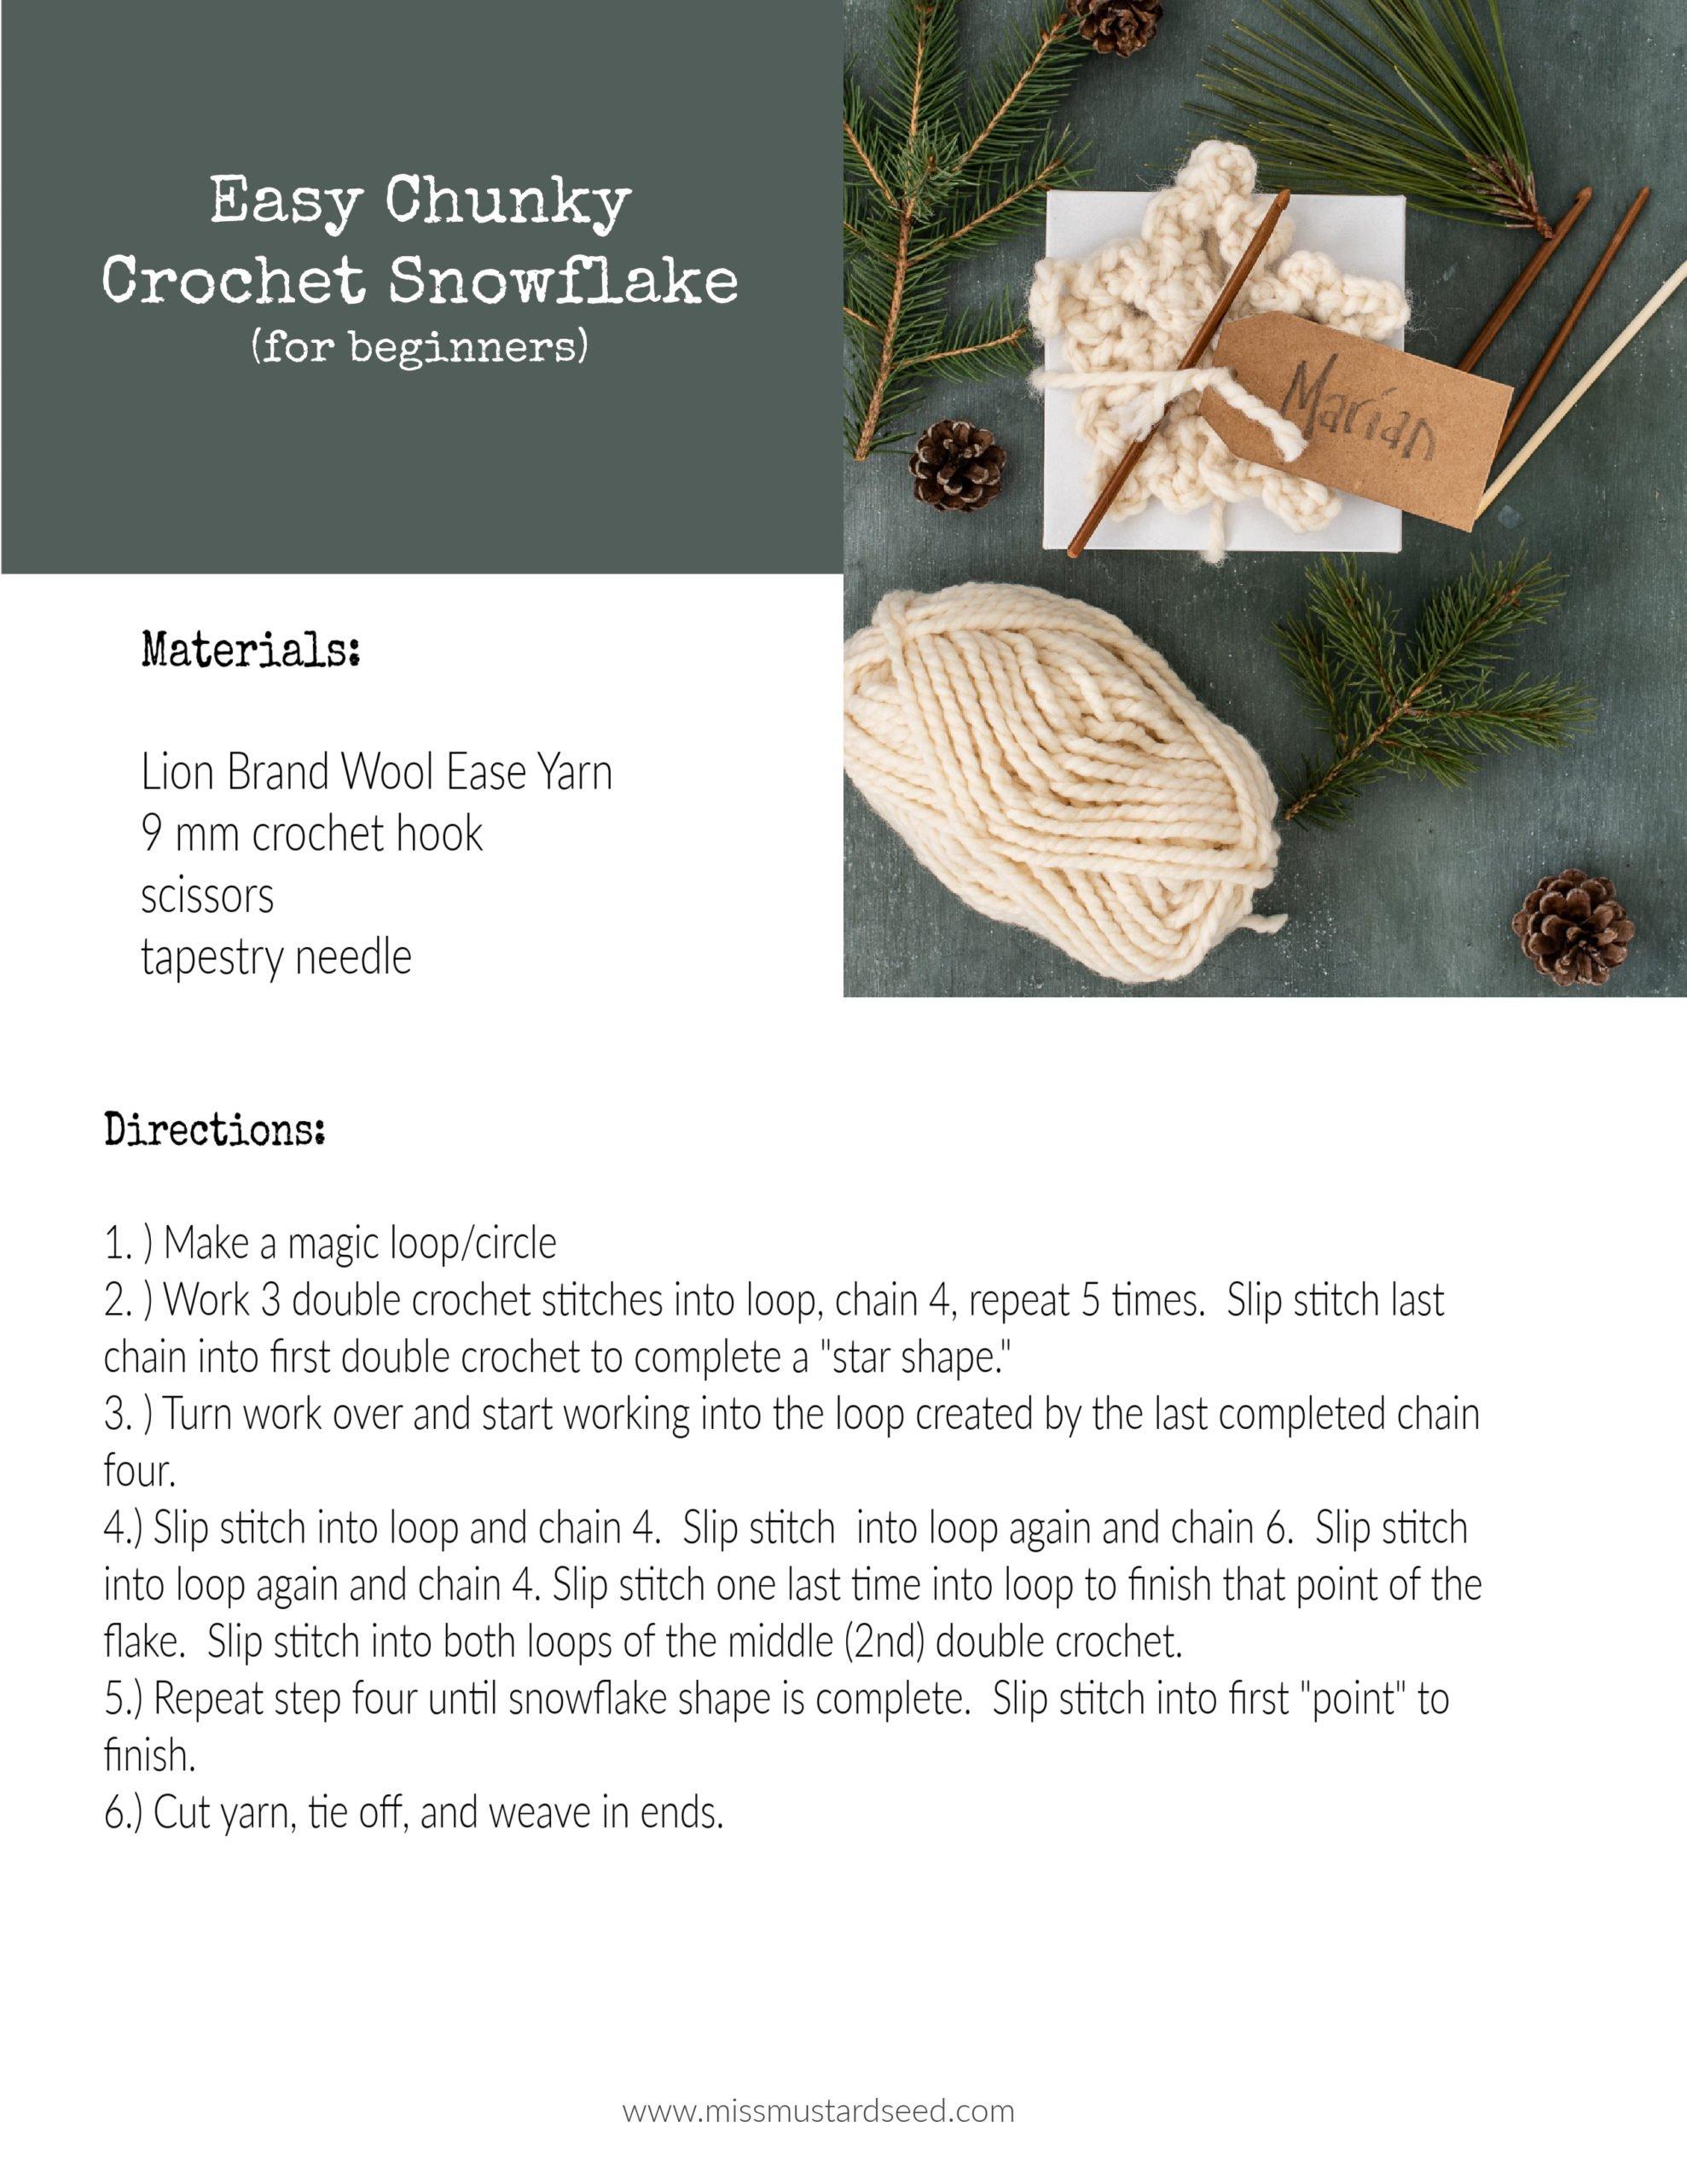 easy chunky crochet snowflake pattern   miss mustard seed